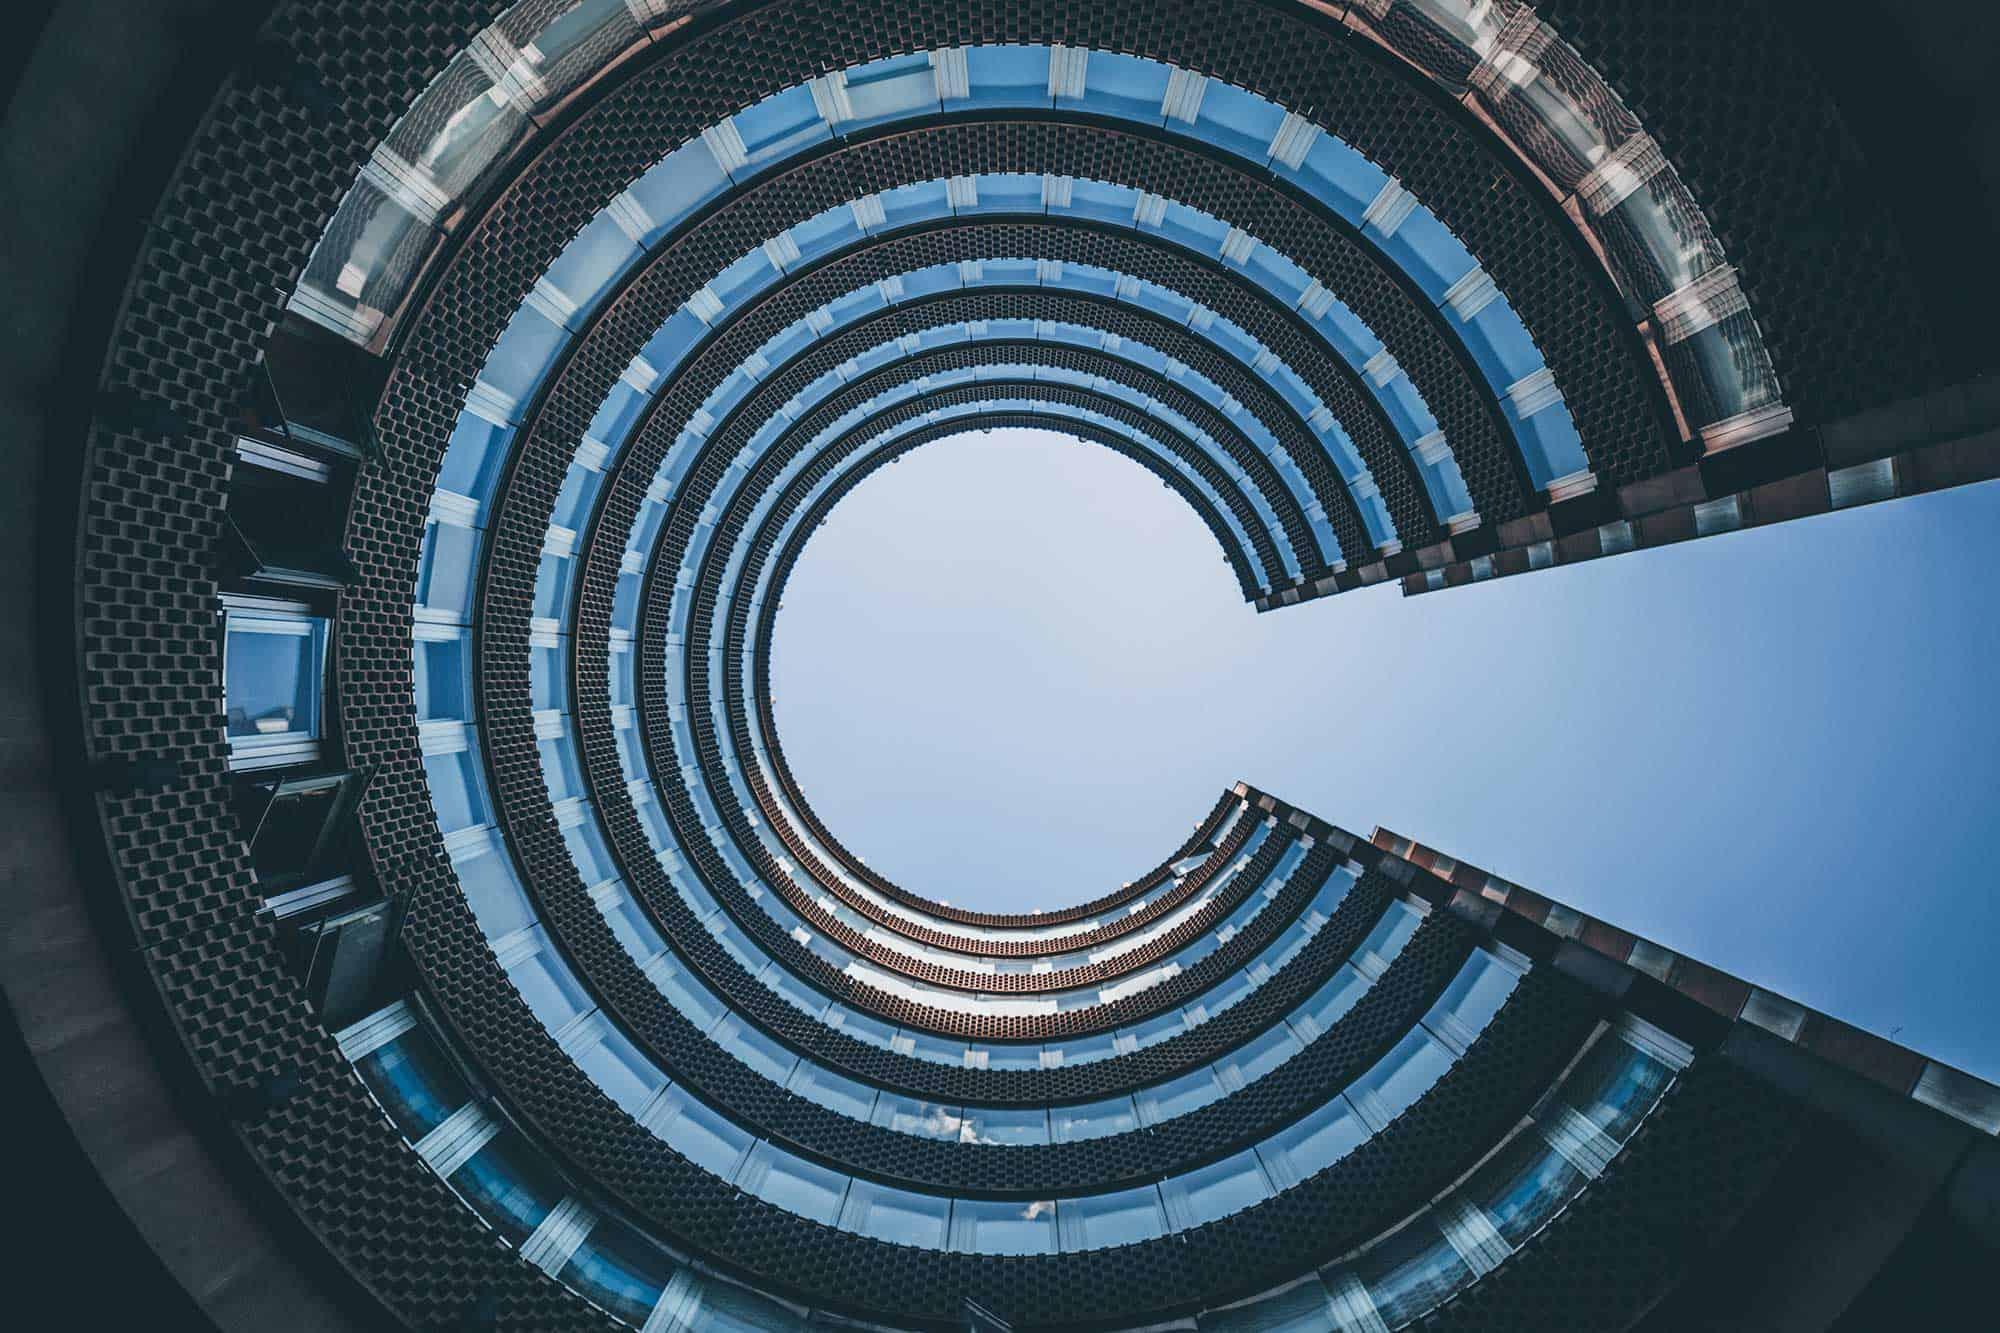 spiral-building